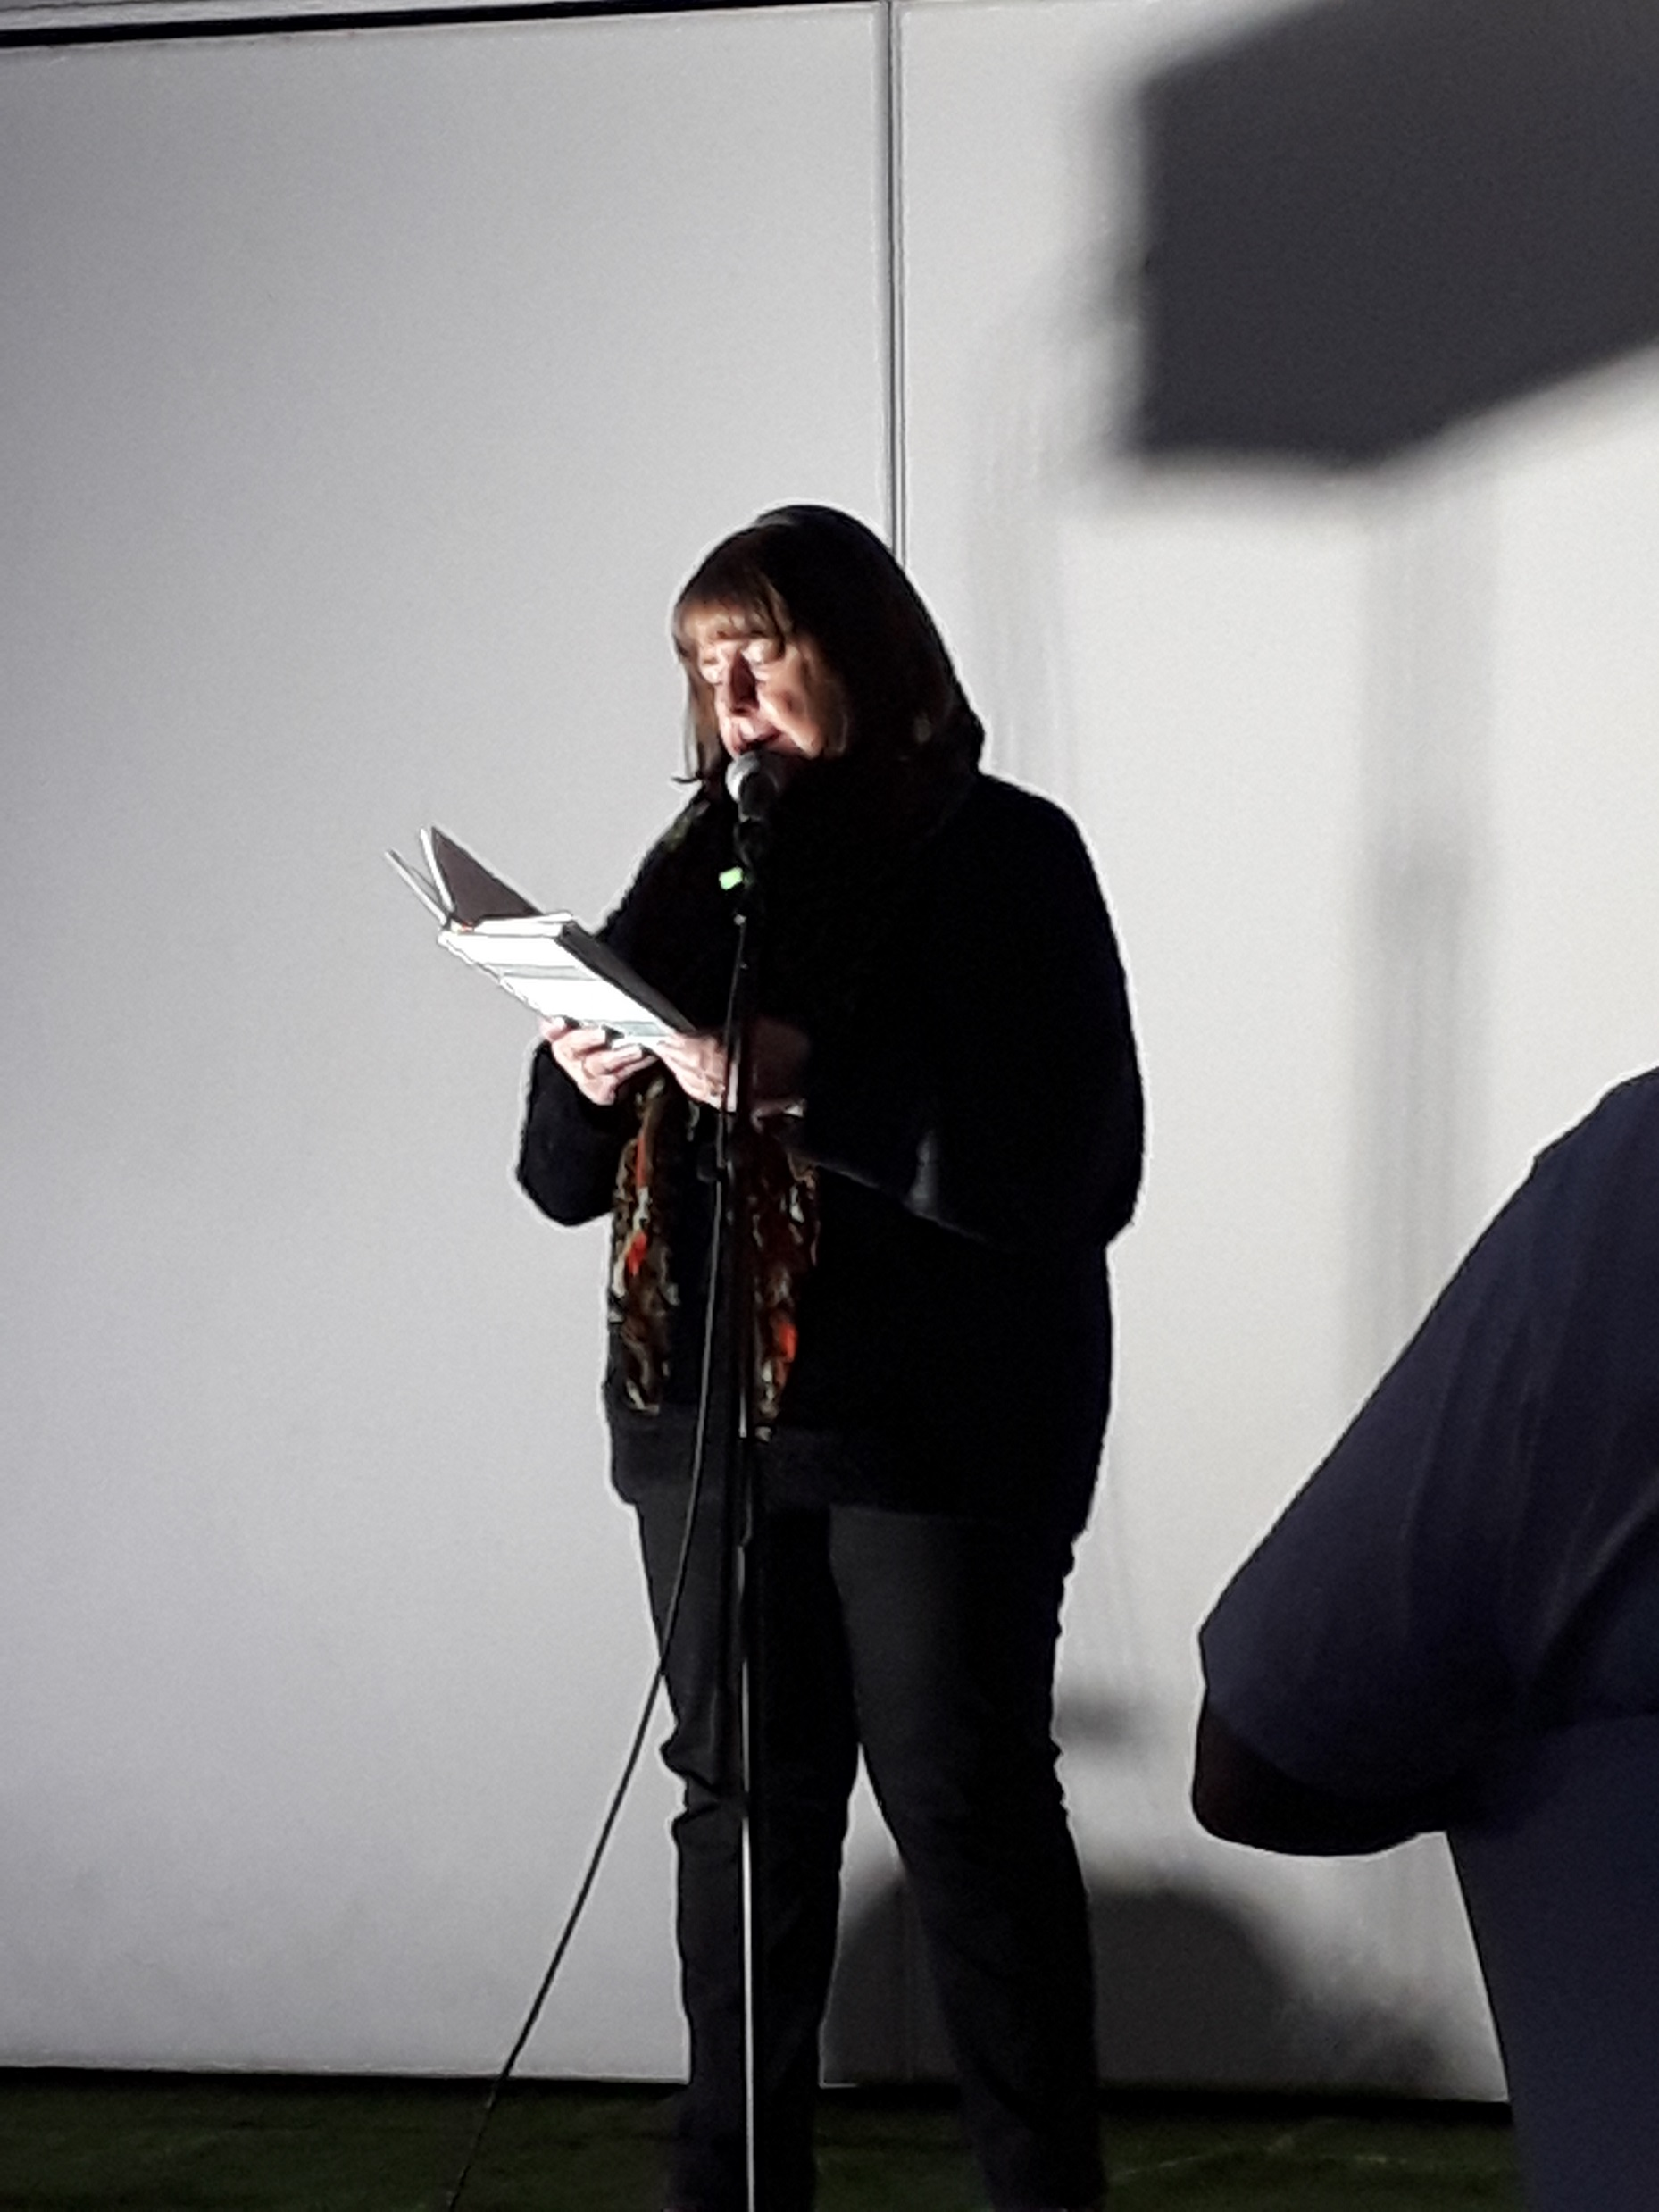 The Enduring Eye (Shackleton photographic exhibition), The Wilson Art Gallery, Chelstenham, February 2019